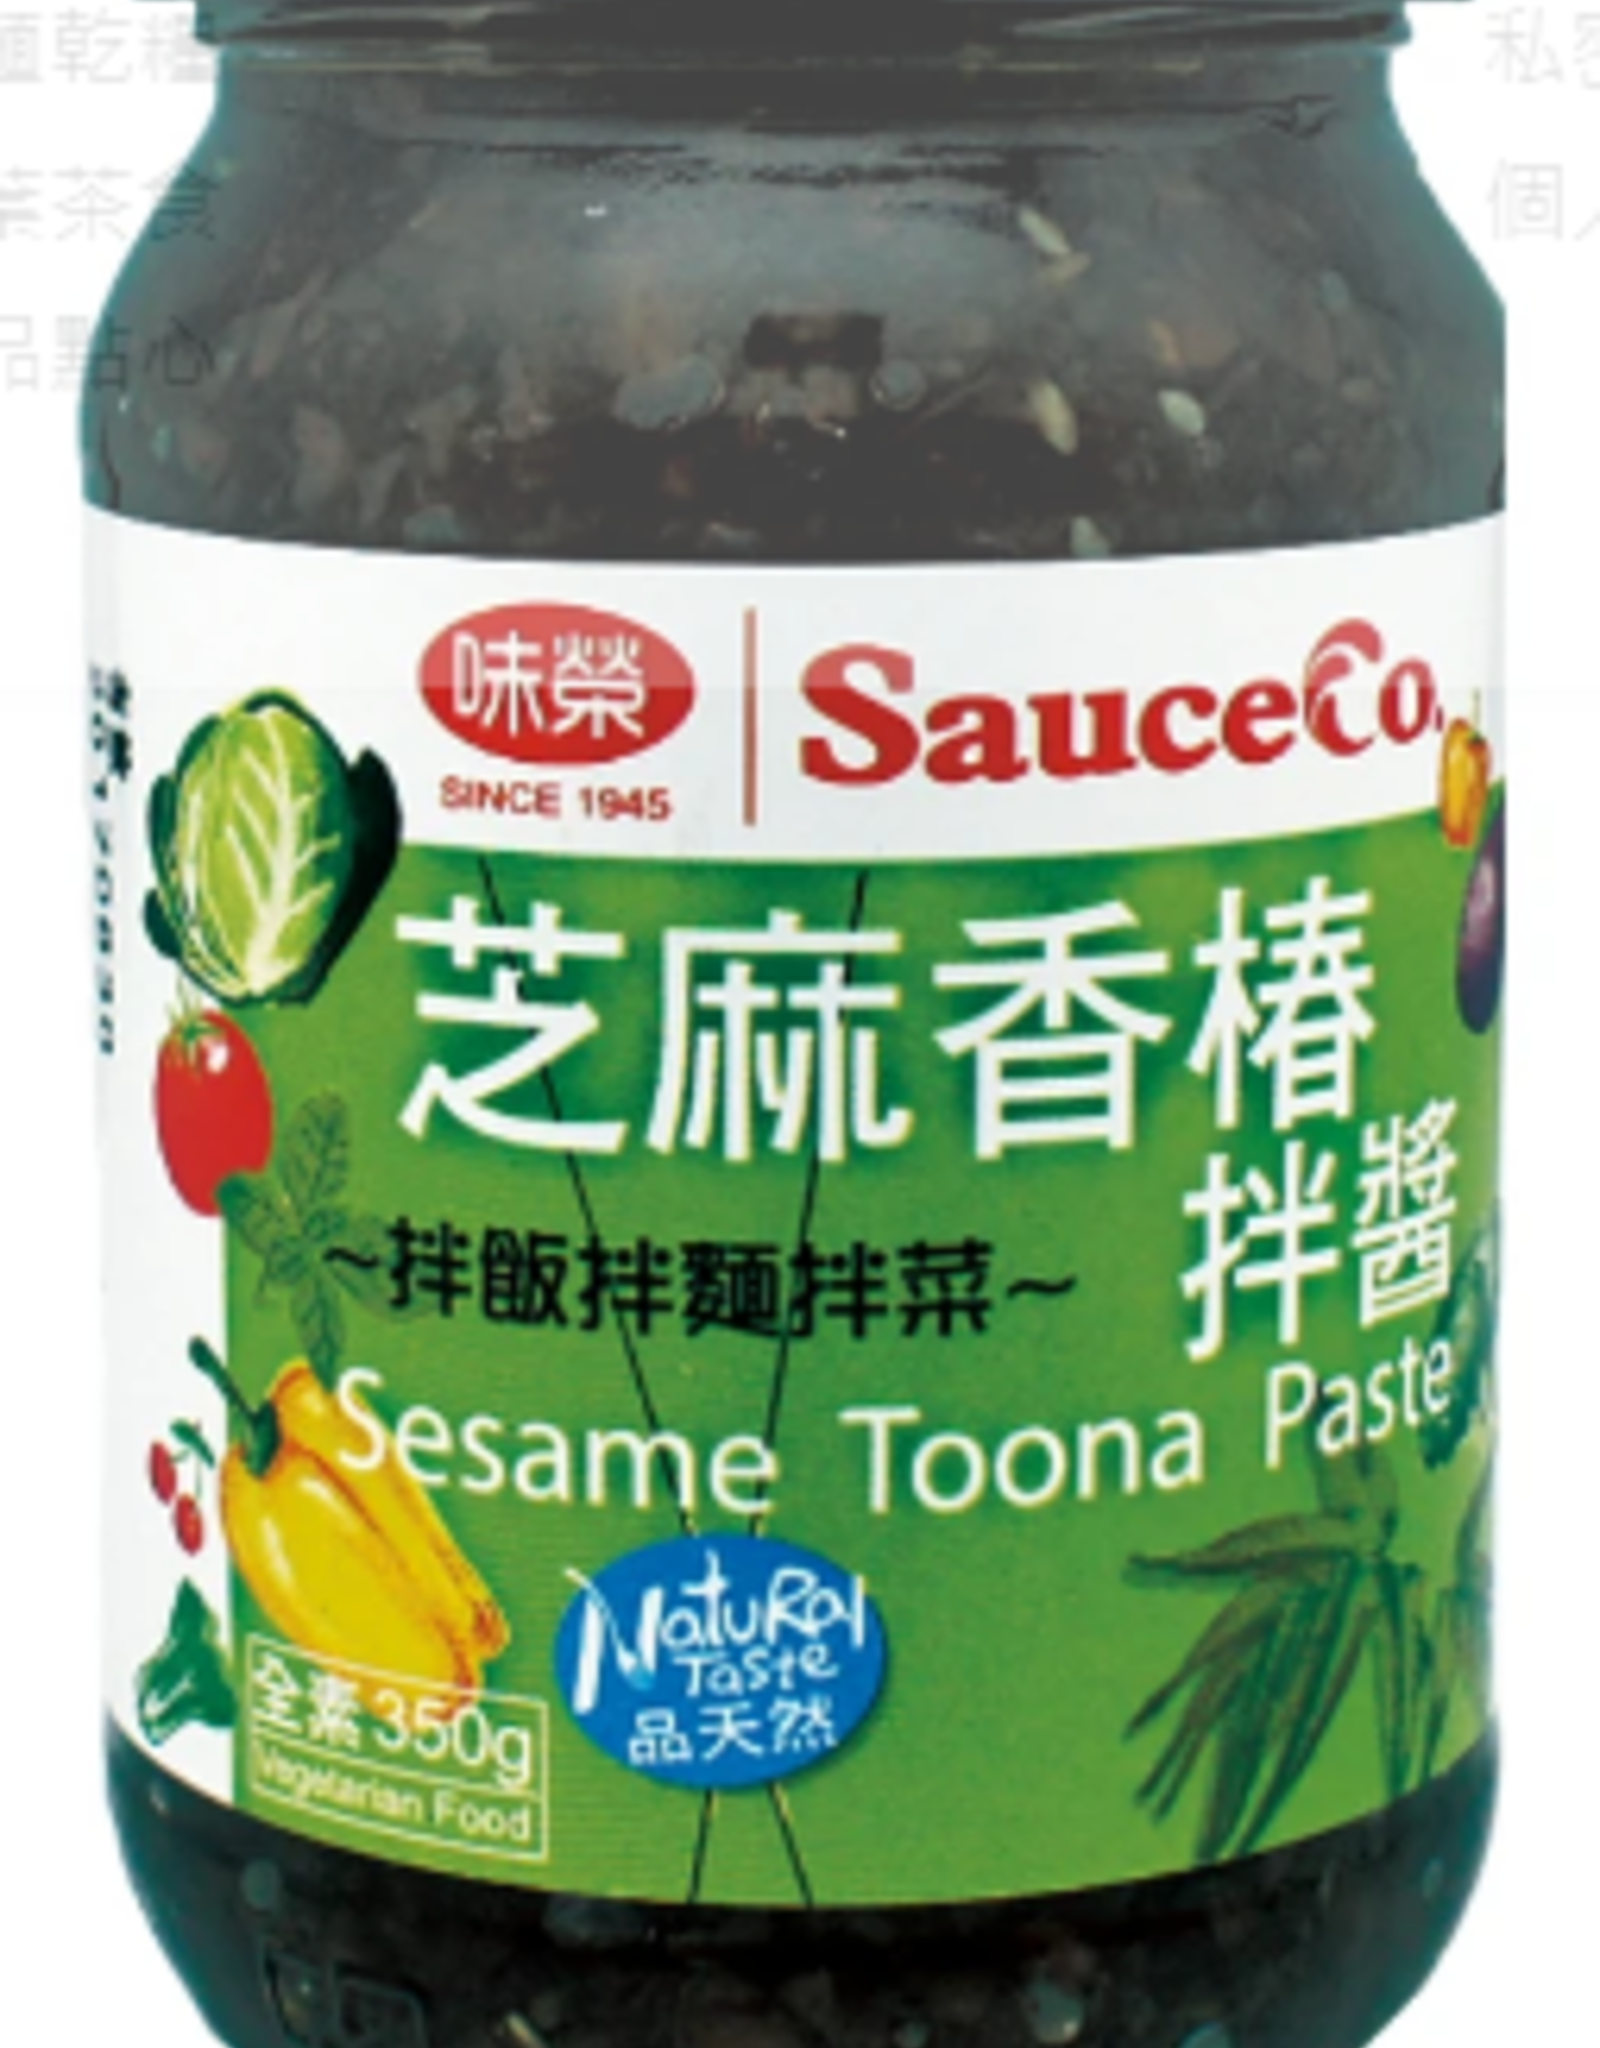 (UK) Vege SauceCo Sesame Toona Paste*(味榮) 芝麻香椿拌醬